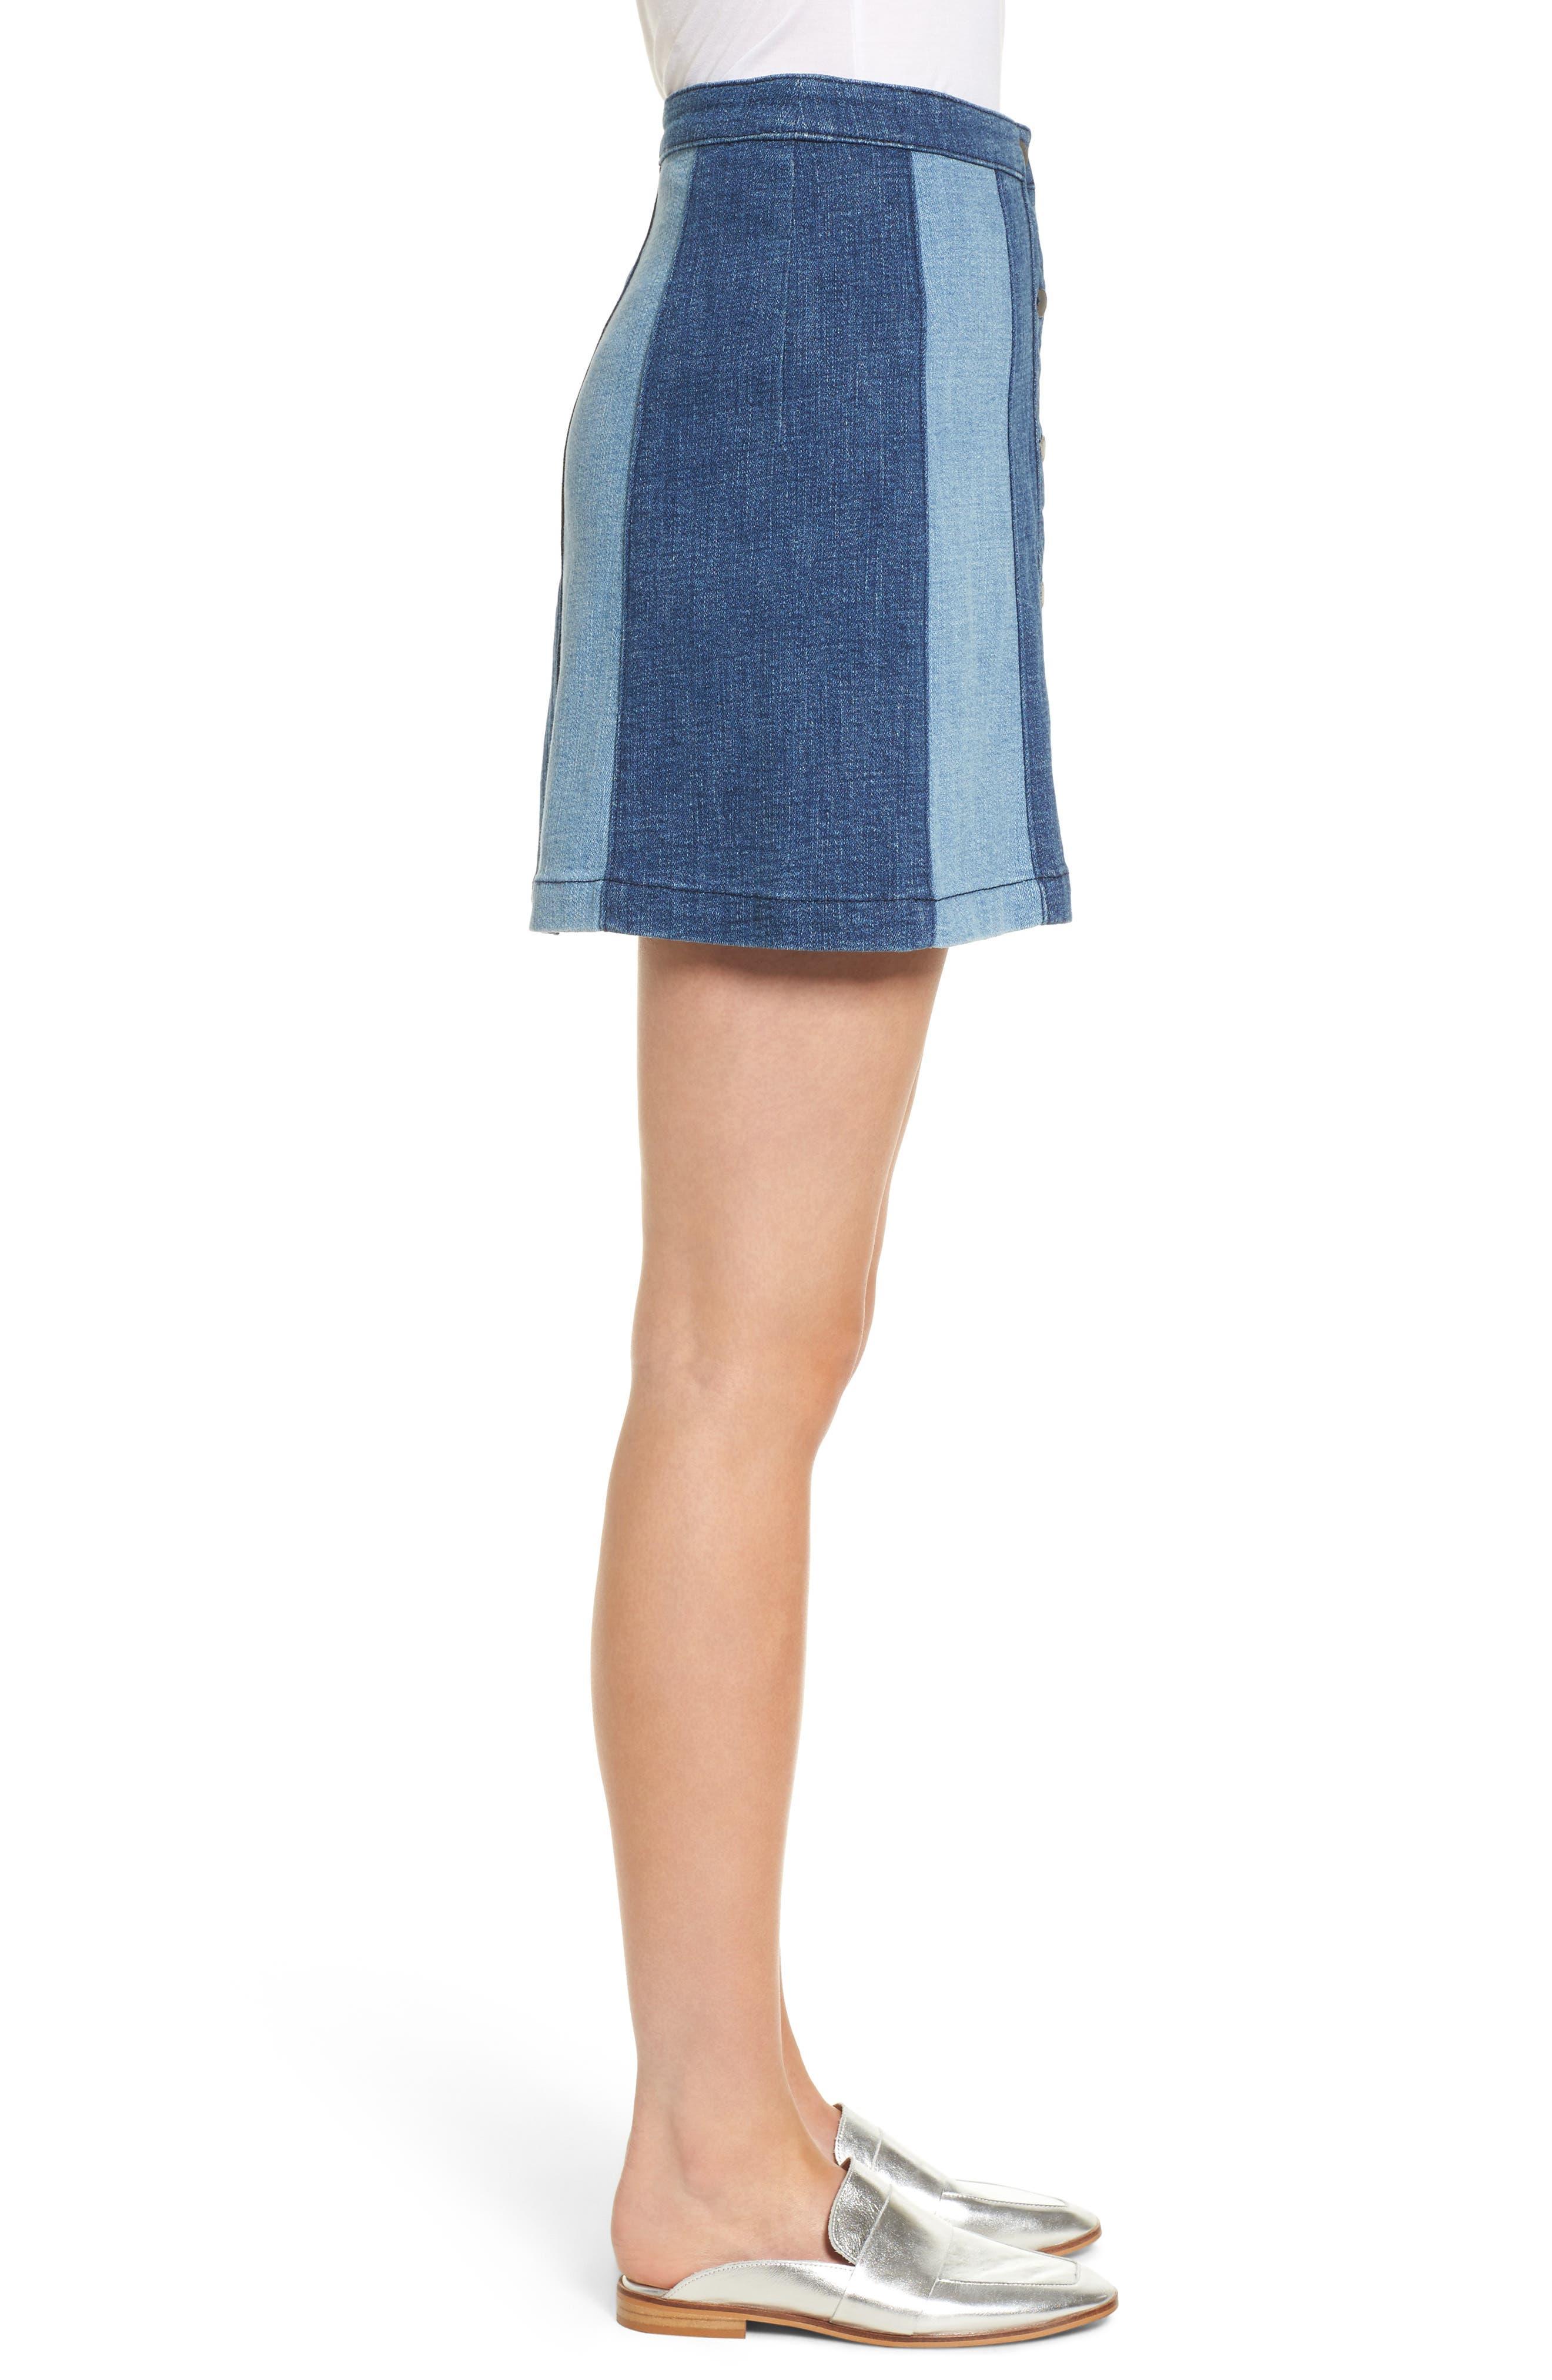 Beatty Denim Miniskirt,                             Alternate thumbnail 3, color,                             Indigo